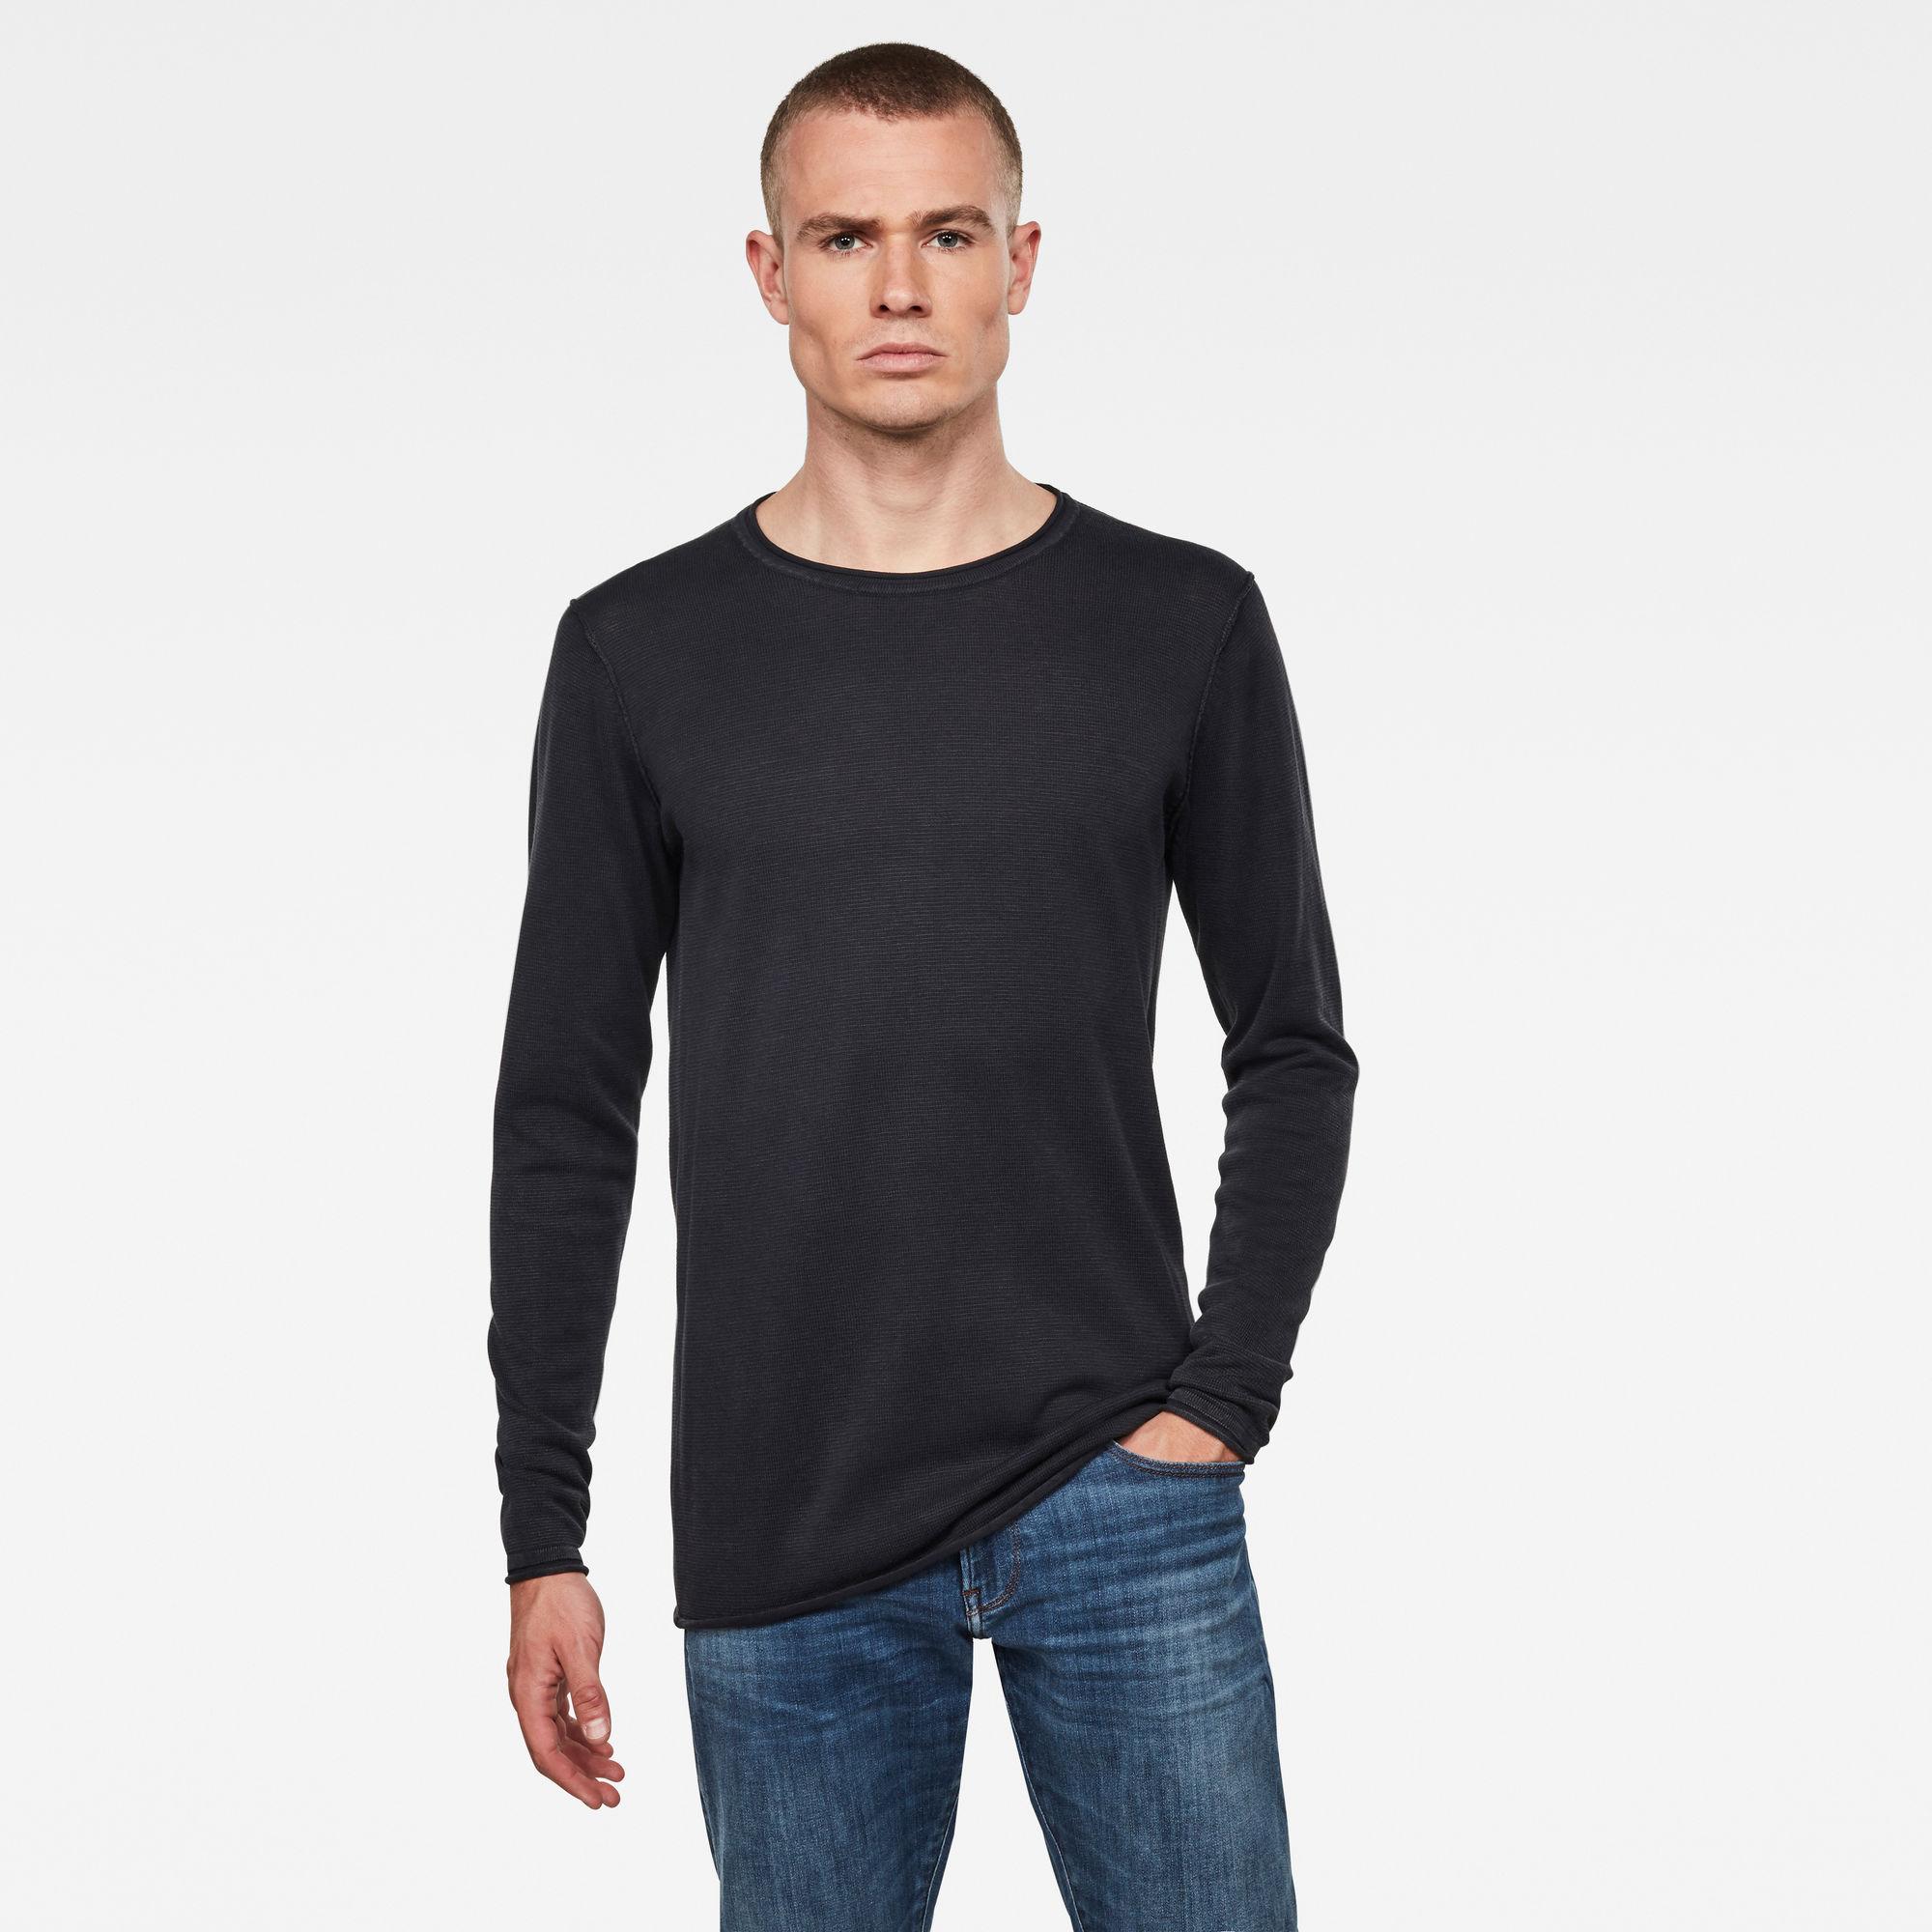 G-Star RAW Heren Bronek Knitted Sweater Zwart